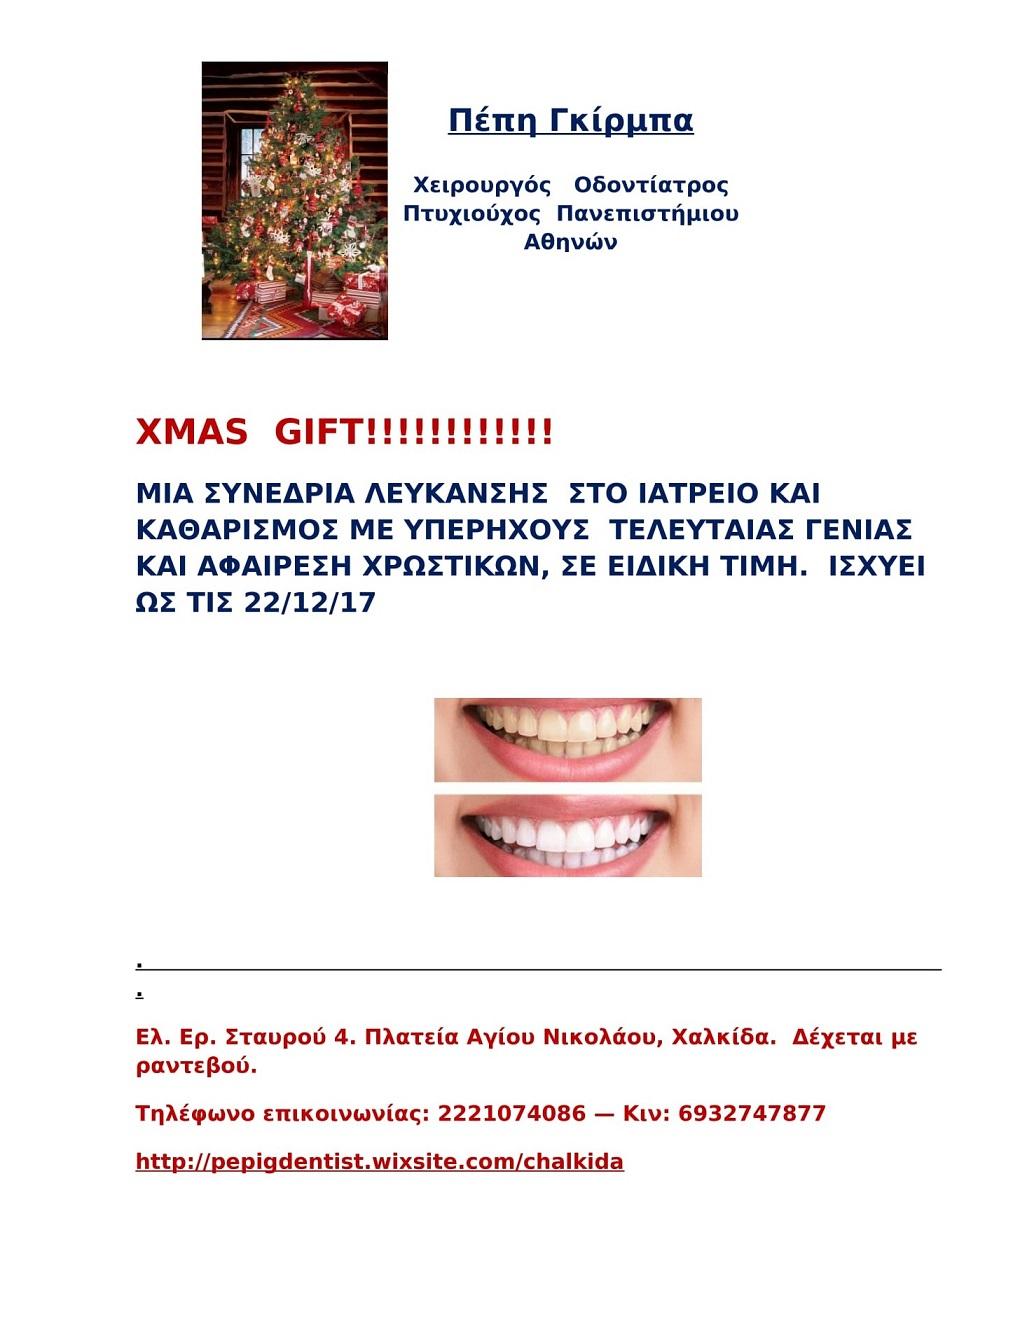 «Xmas gift» : Συνεδρία λεύκανσης καθαρισμός δοντιών και αφαίρεση χρωστικών σε ειδική τιμή ! XMAS GIFT 1